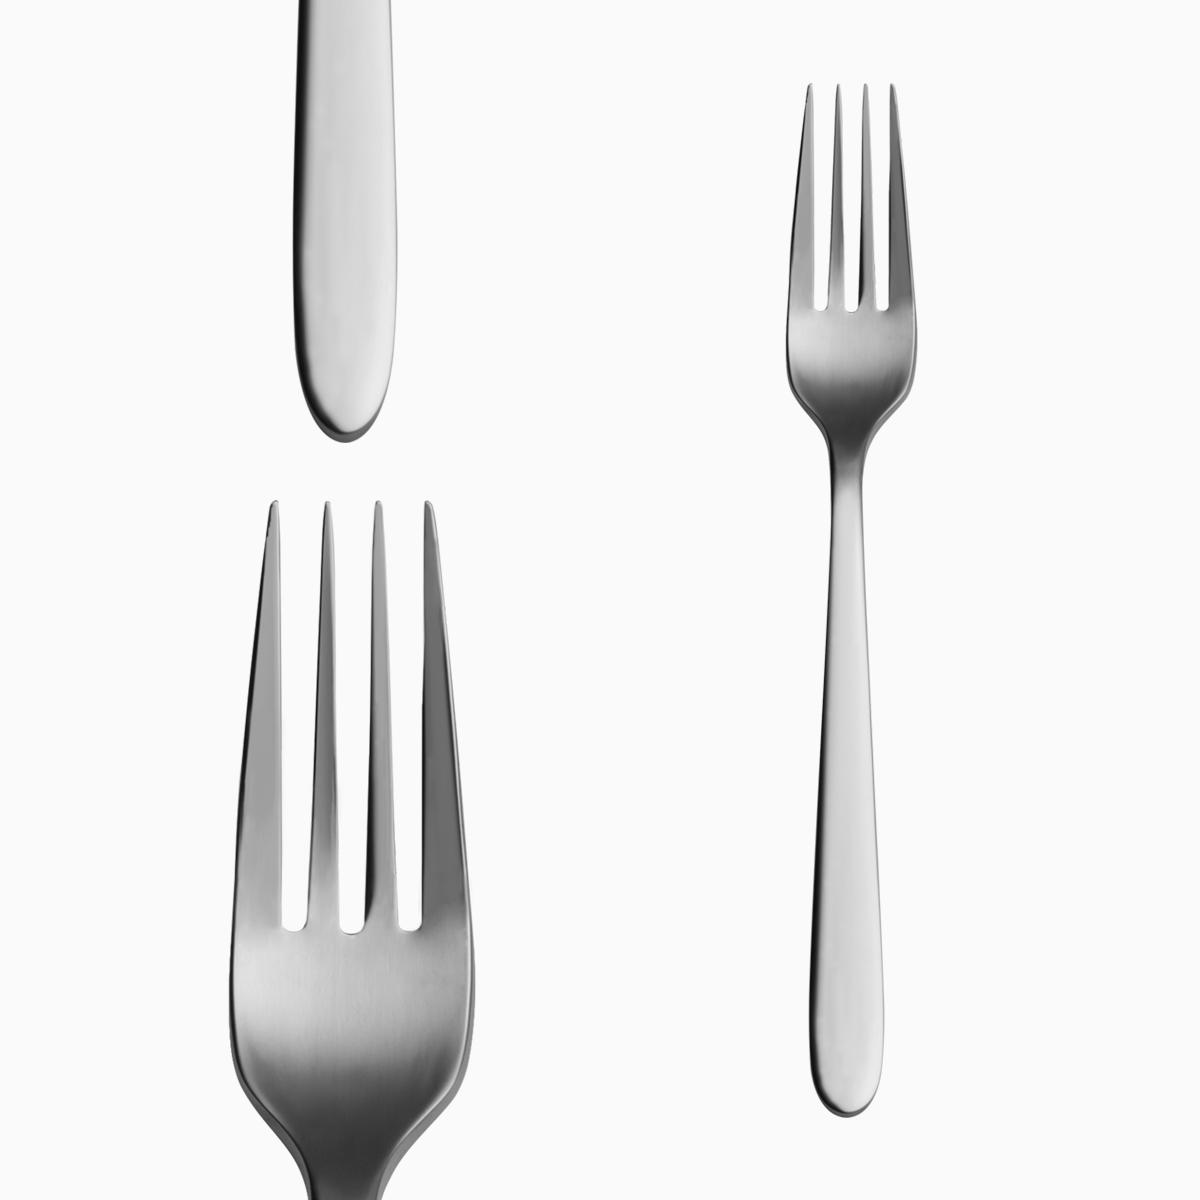 Table fork - Callisto CNS